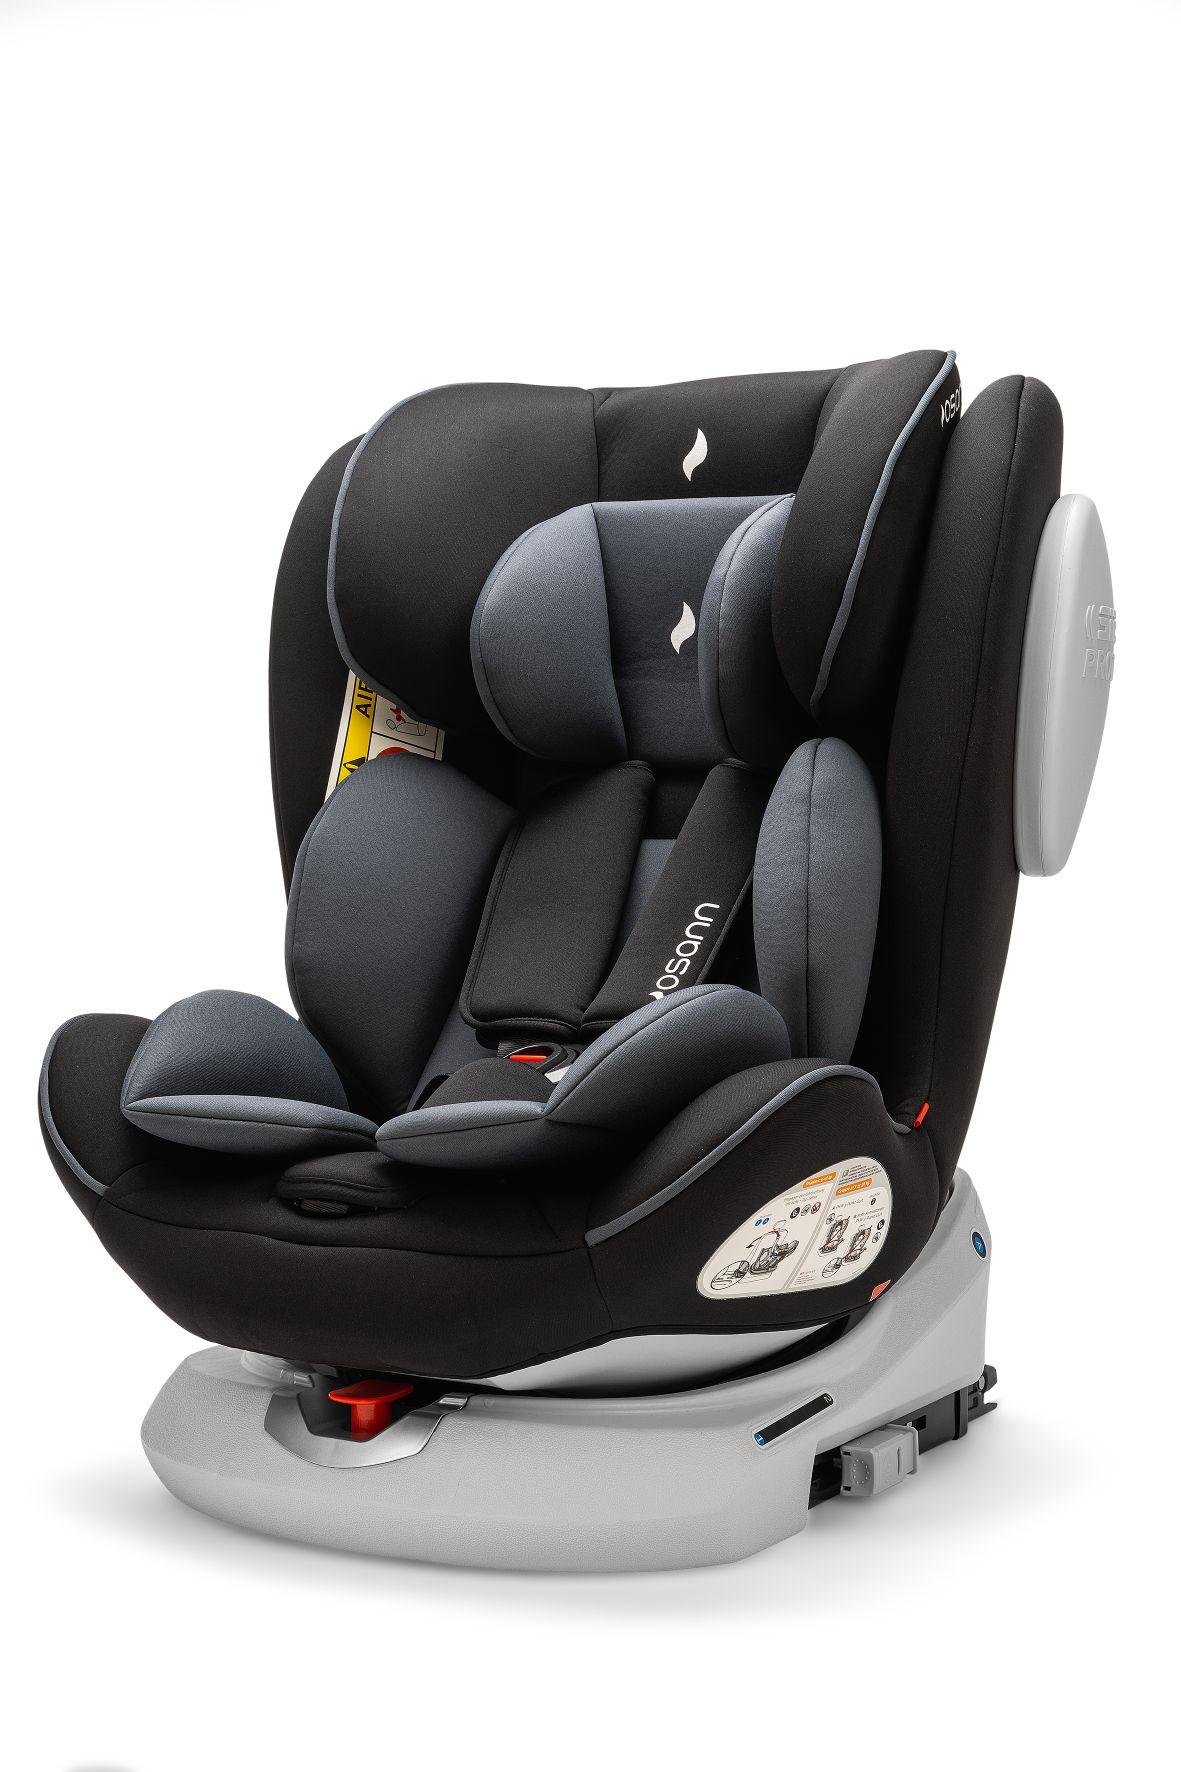 Osann Four360 Kinderautositz 0-12 Jahre max 36 kg, Kaufland